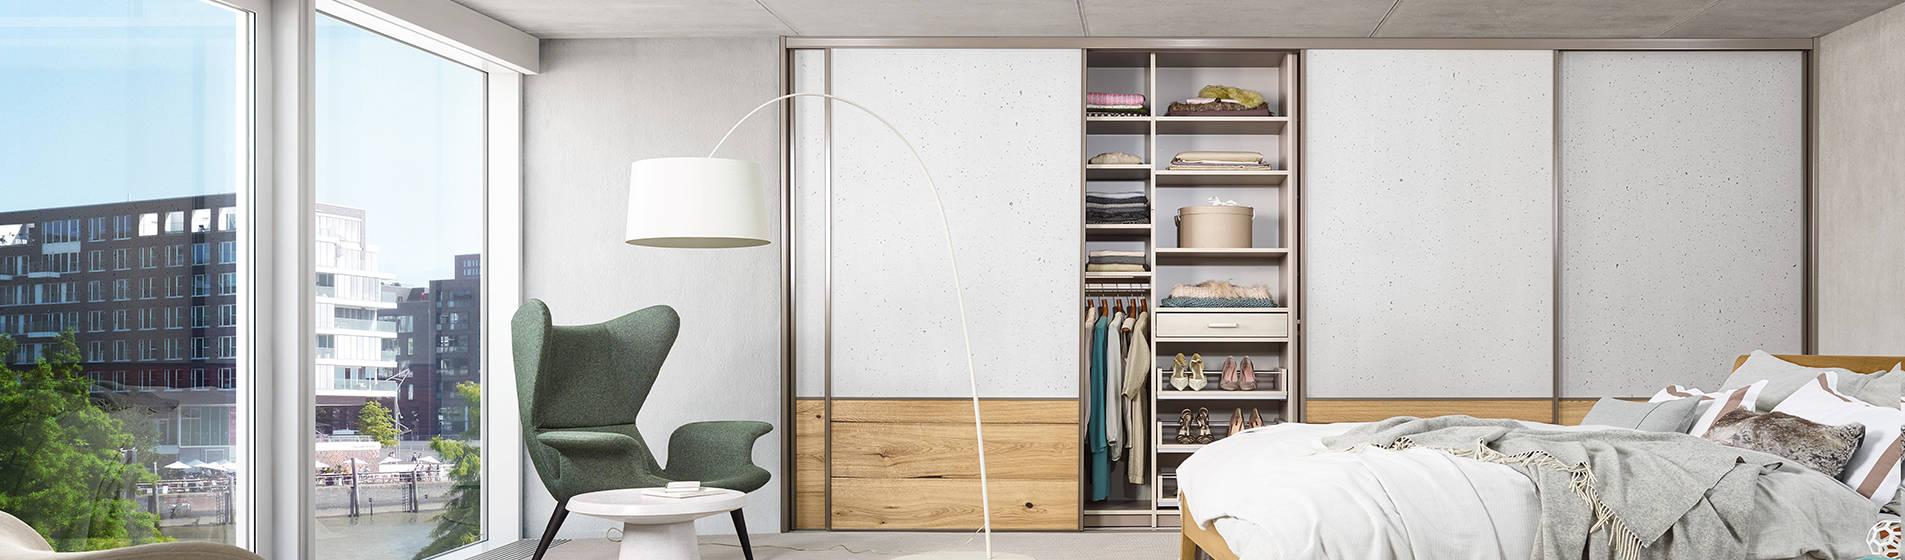 begehbare kleiderschr nke by cabinet schranksysteme ag homify. Black Bedroom Furniture Sets. Home Design Ideas